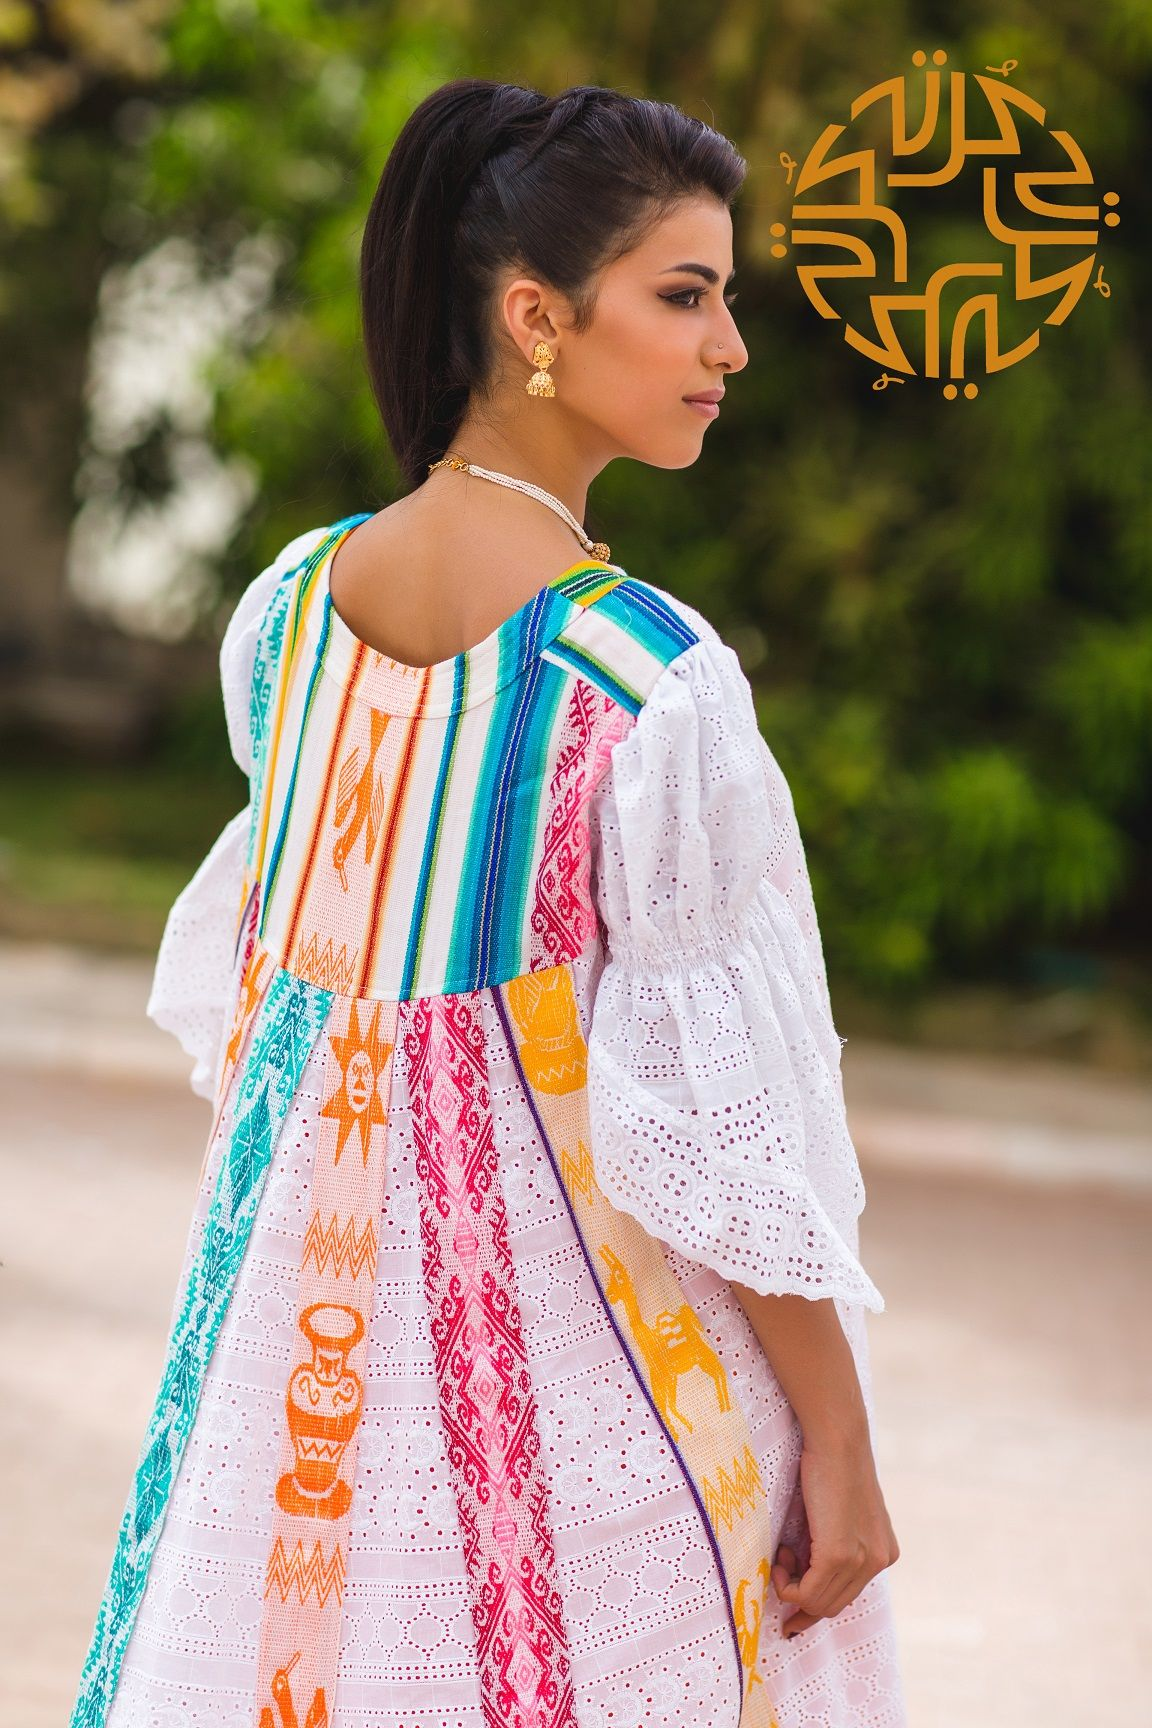 Pin by LaLeLo on Fashion Arabian Pinterest